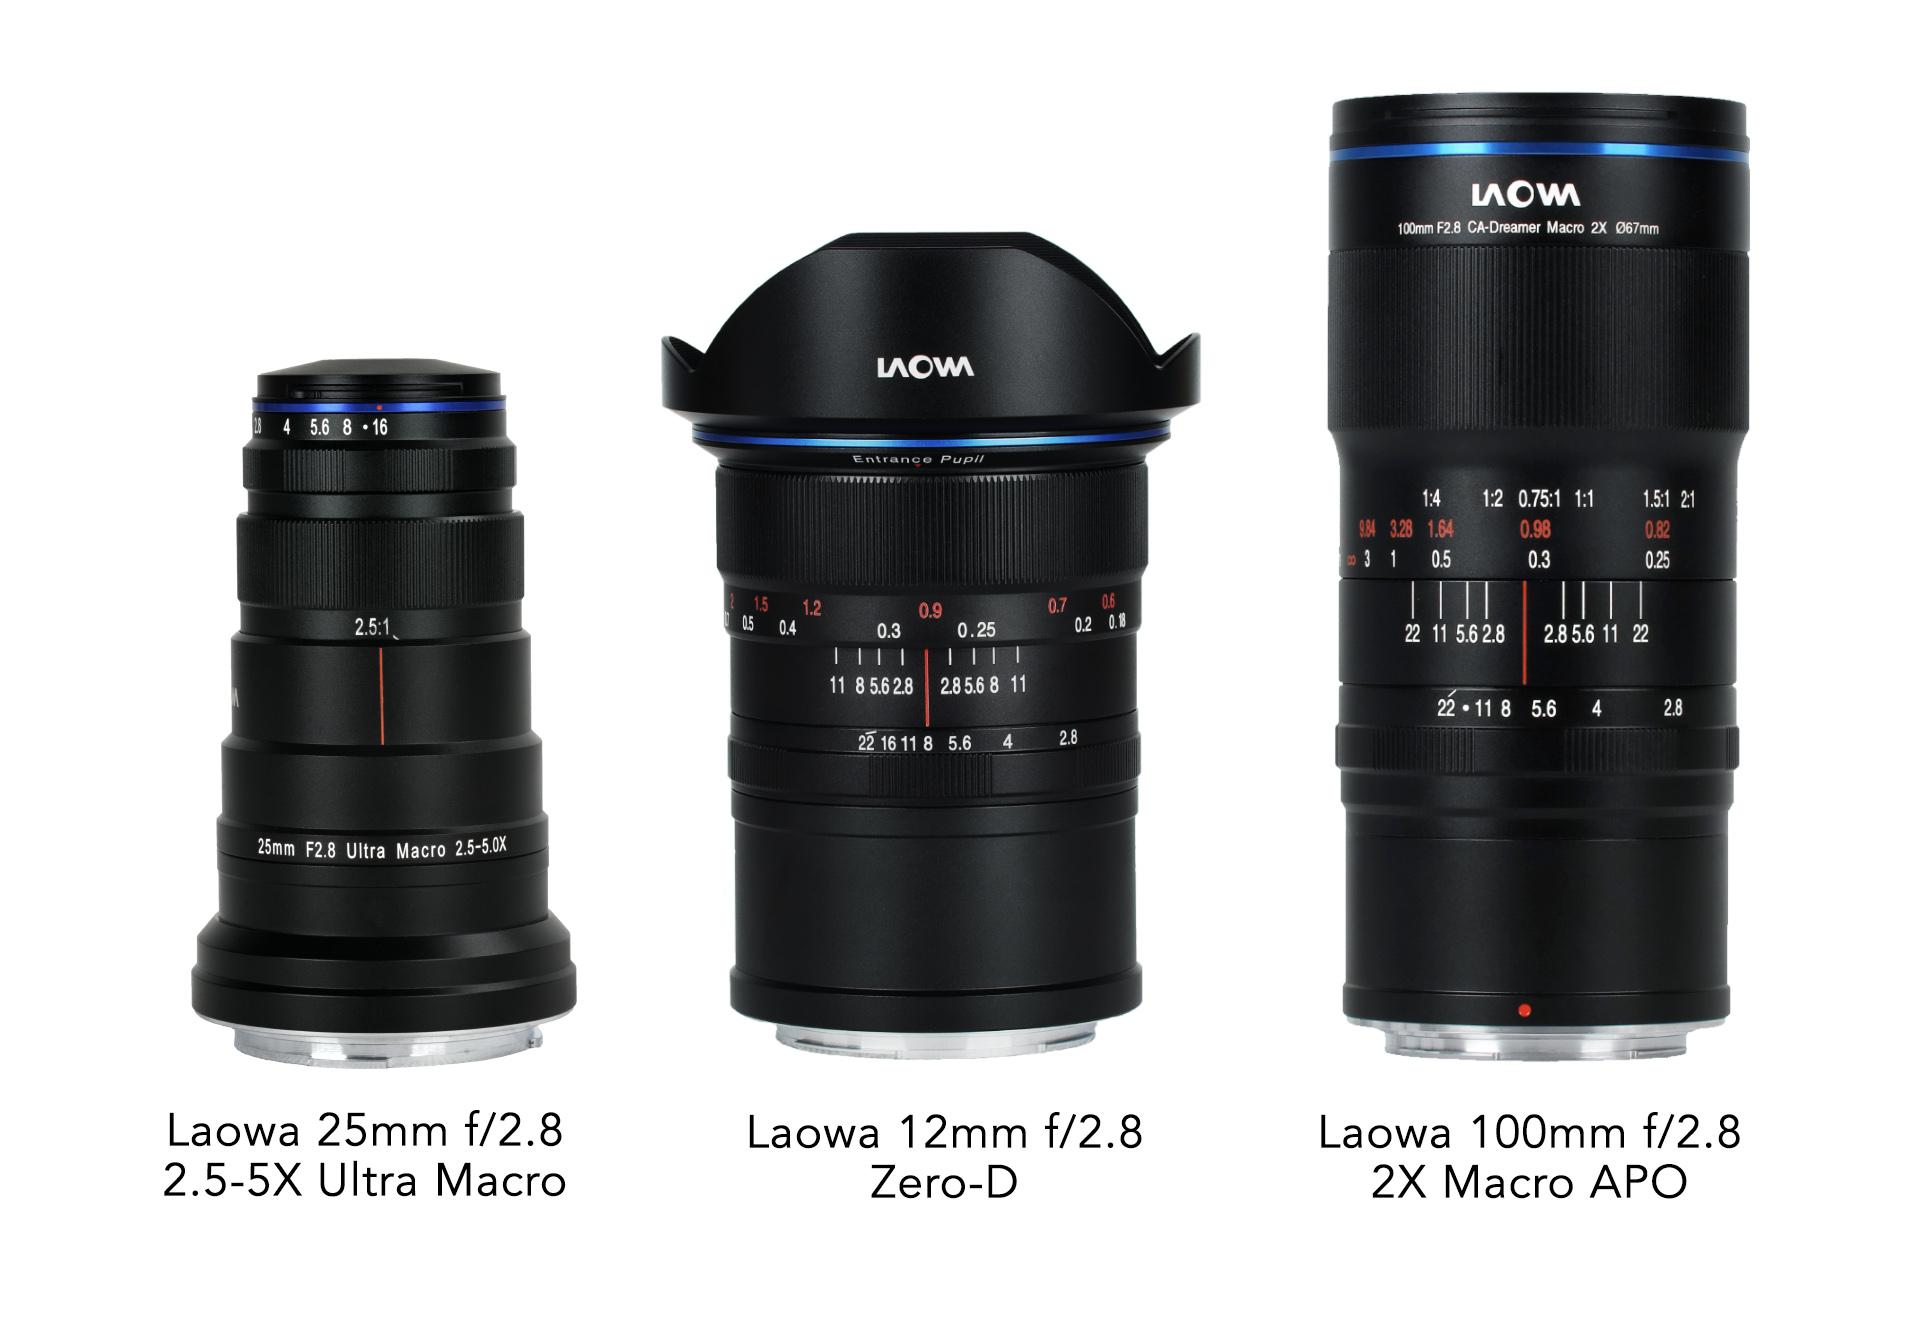 Venus Optics adds Canon RF, Nikon Z mount options to three